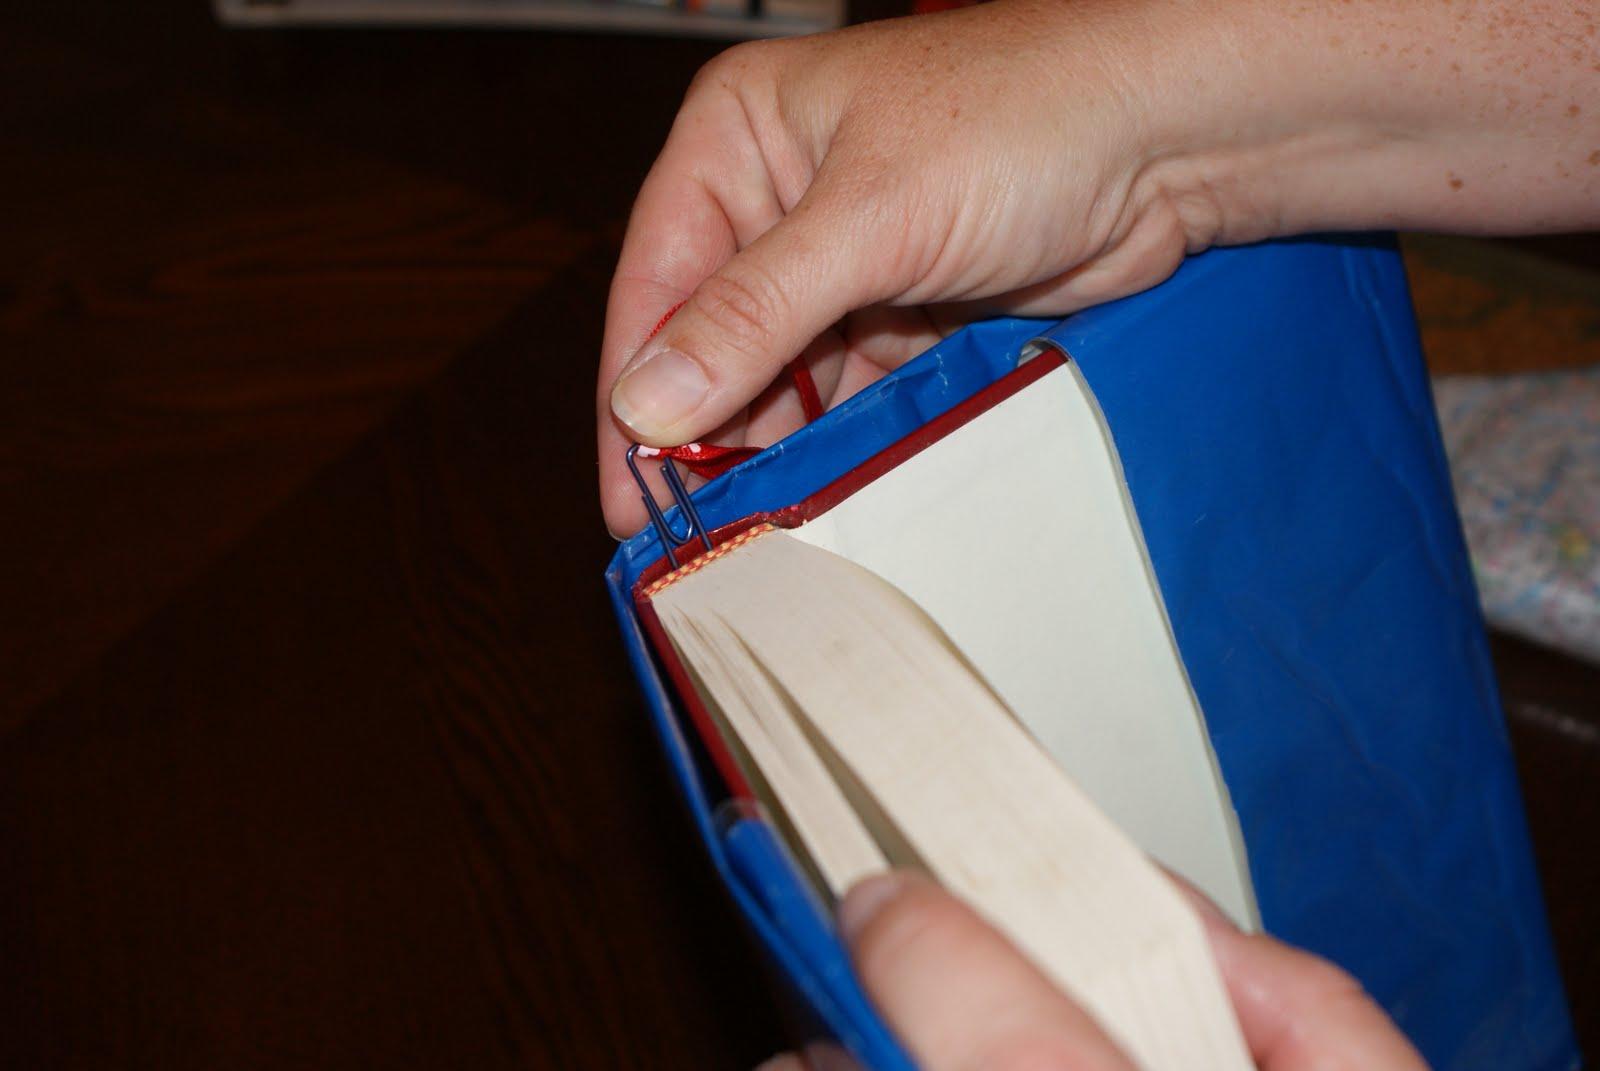 http://3.bp.blogspot.com/-8EaKg4FDcBw/TkrCqSDJlgI/AAAAAAAAABc/1xpHczvCZ14/s1600/Paper+clip+2.JPG